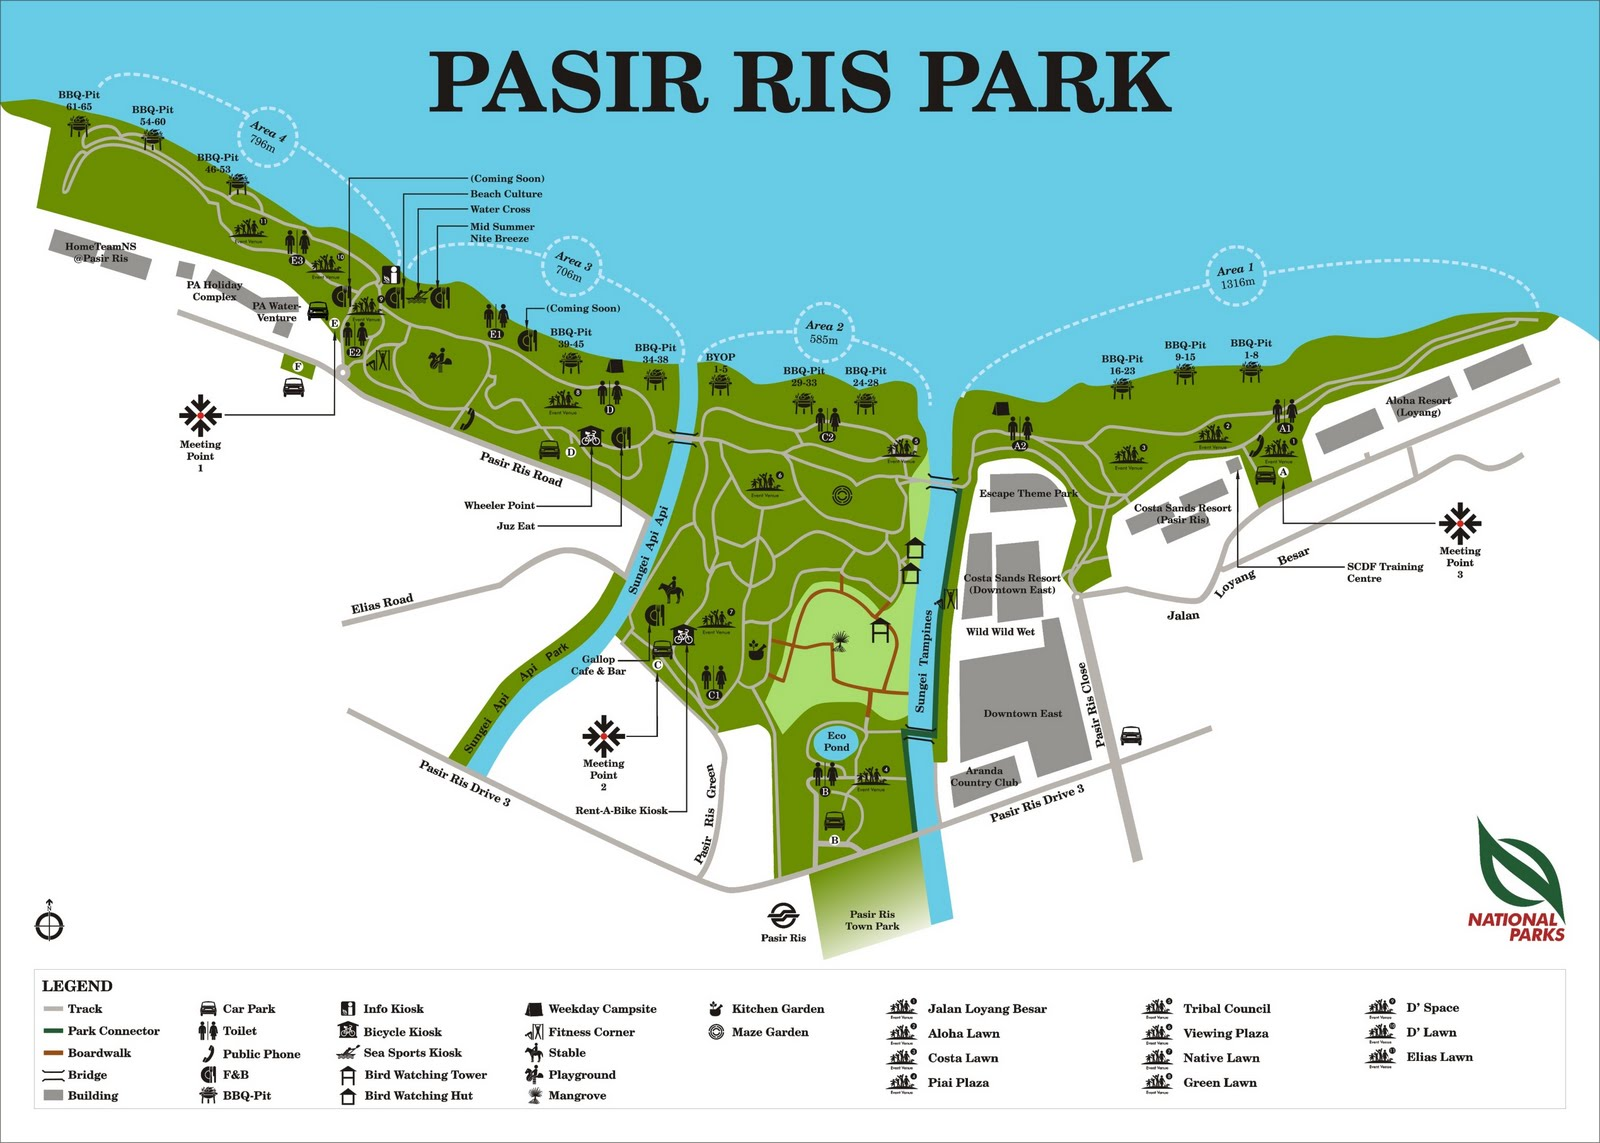 http://4.bp.blogspot.com/_F3bGAFOny9Y/SwjL70sOvdI/AAAAAAAAAHk/WAS0_8h9Vp0/s1600/Pasir+Ris+Park+map(281008)1_1225327445.jpg